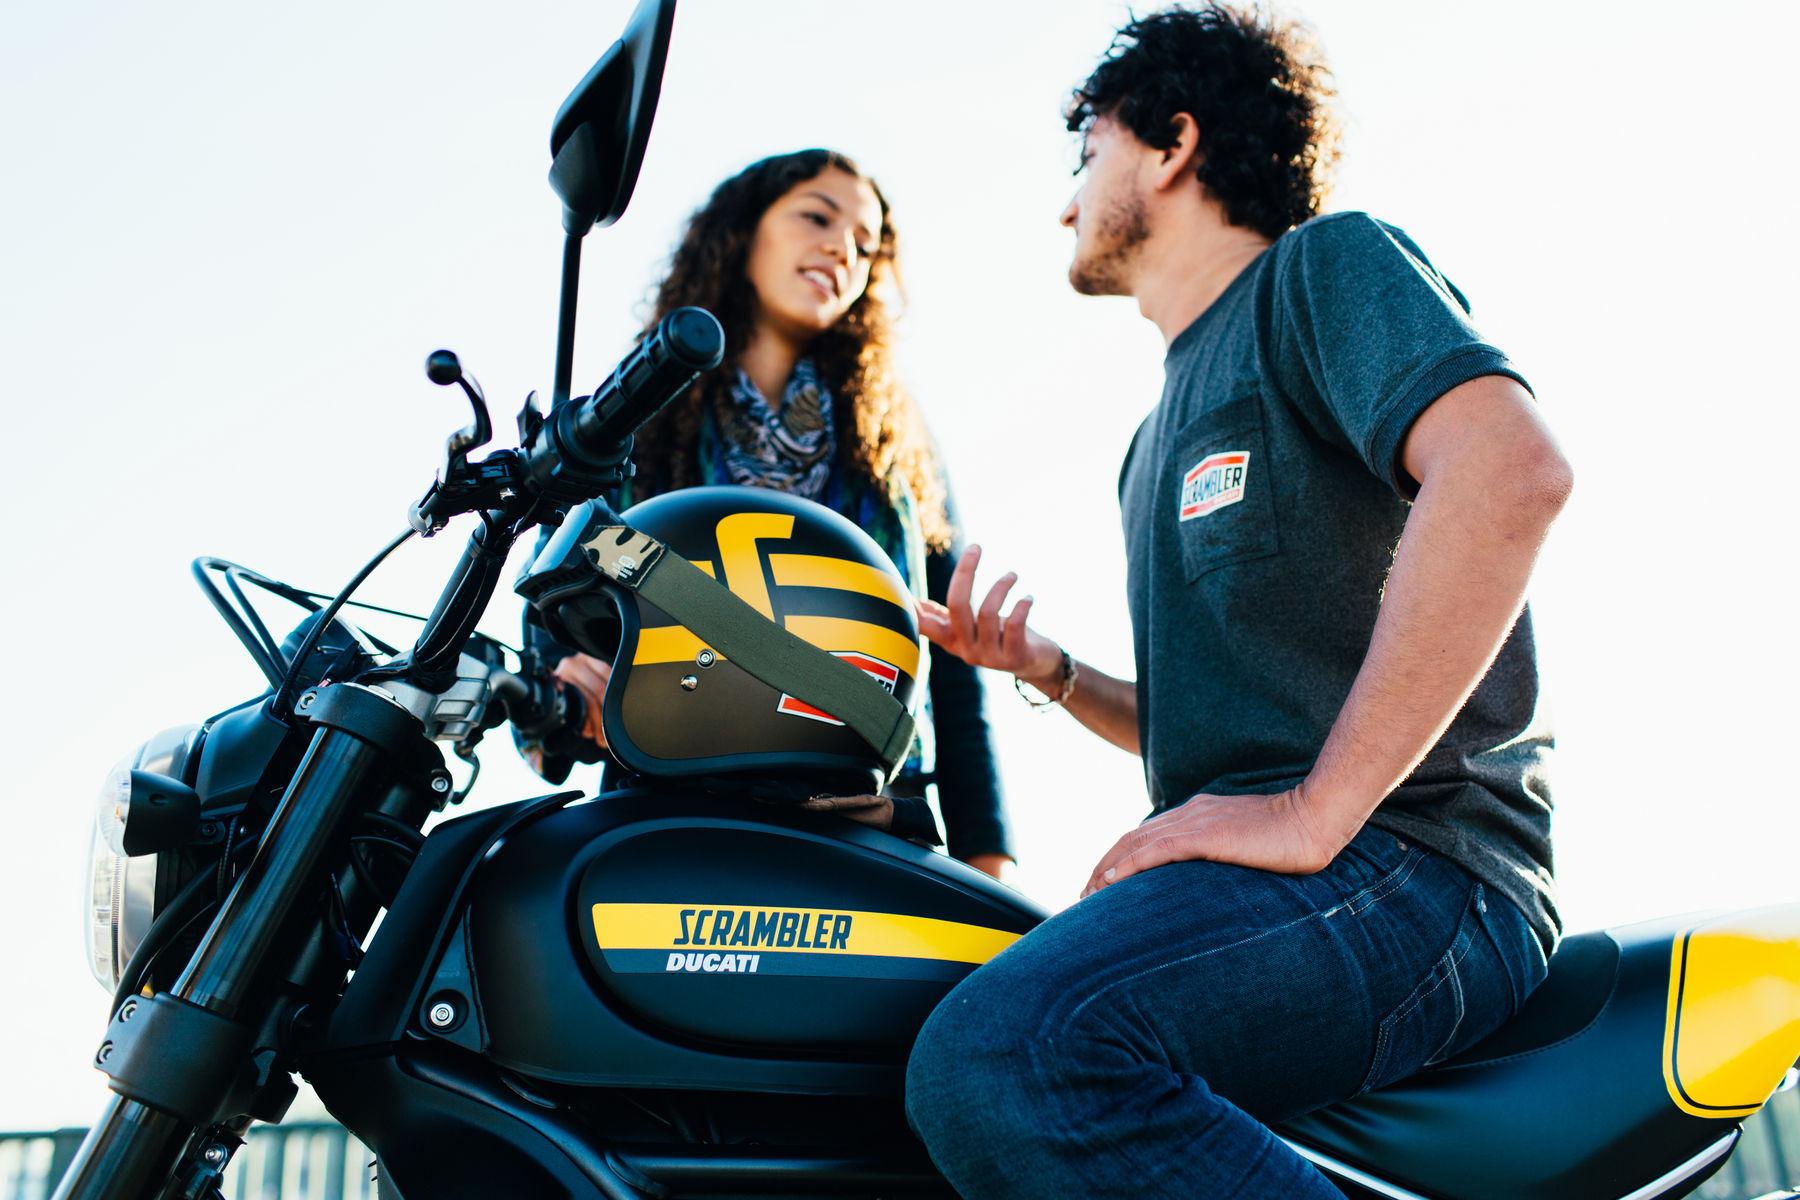 2015 Ducati Scrambler Full Throttle | Ducati Scrambler - Pre-ride Talk